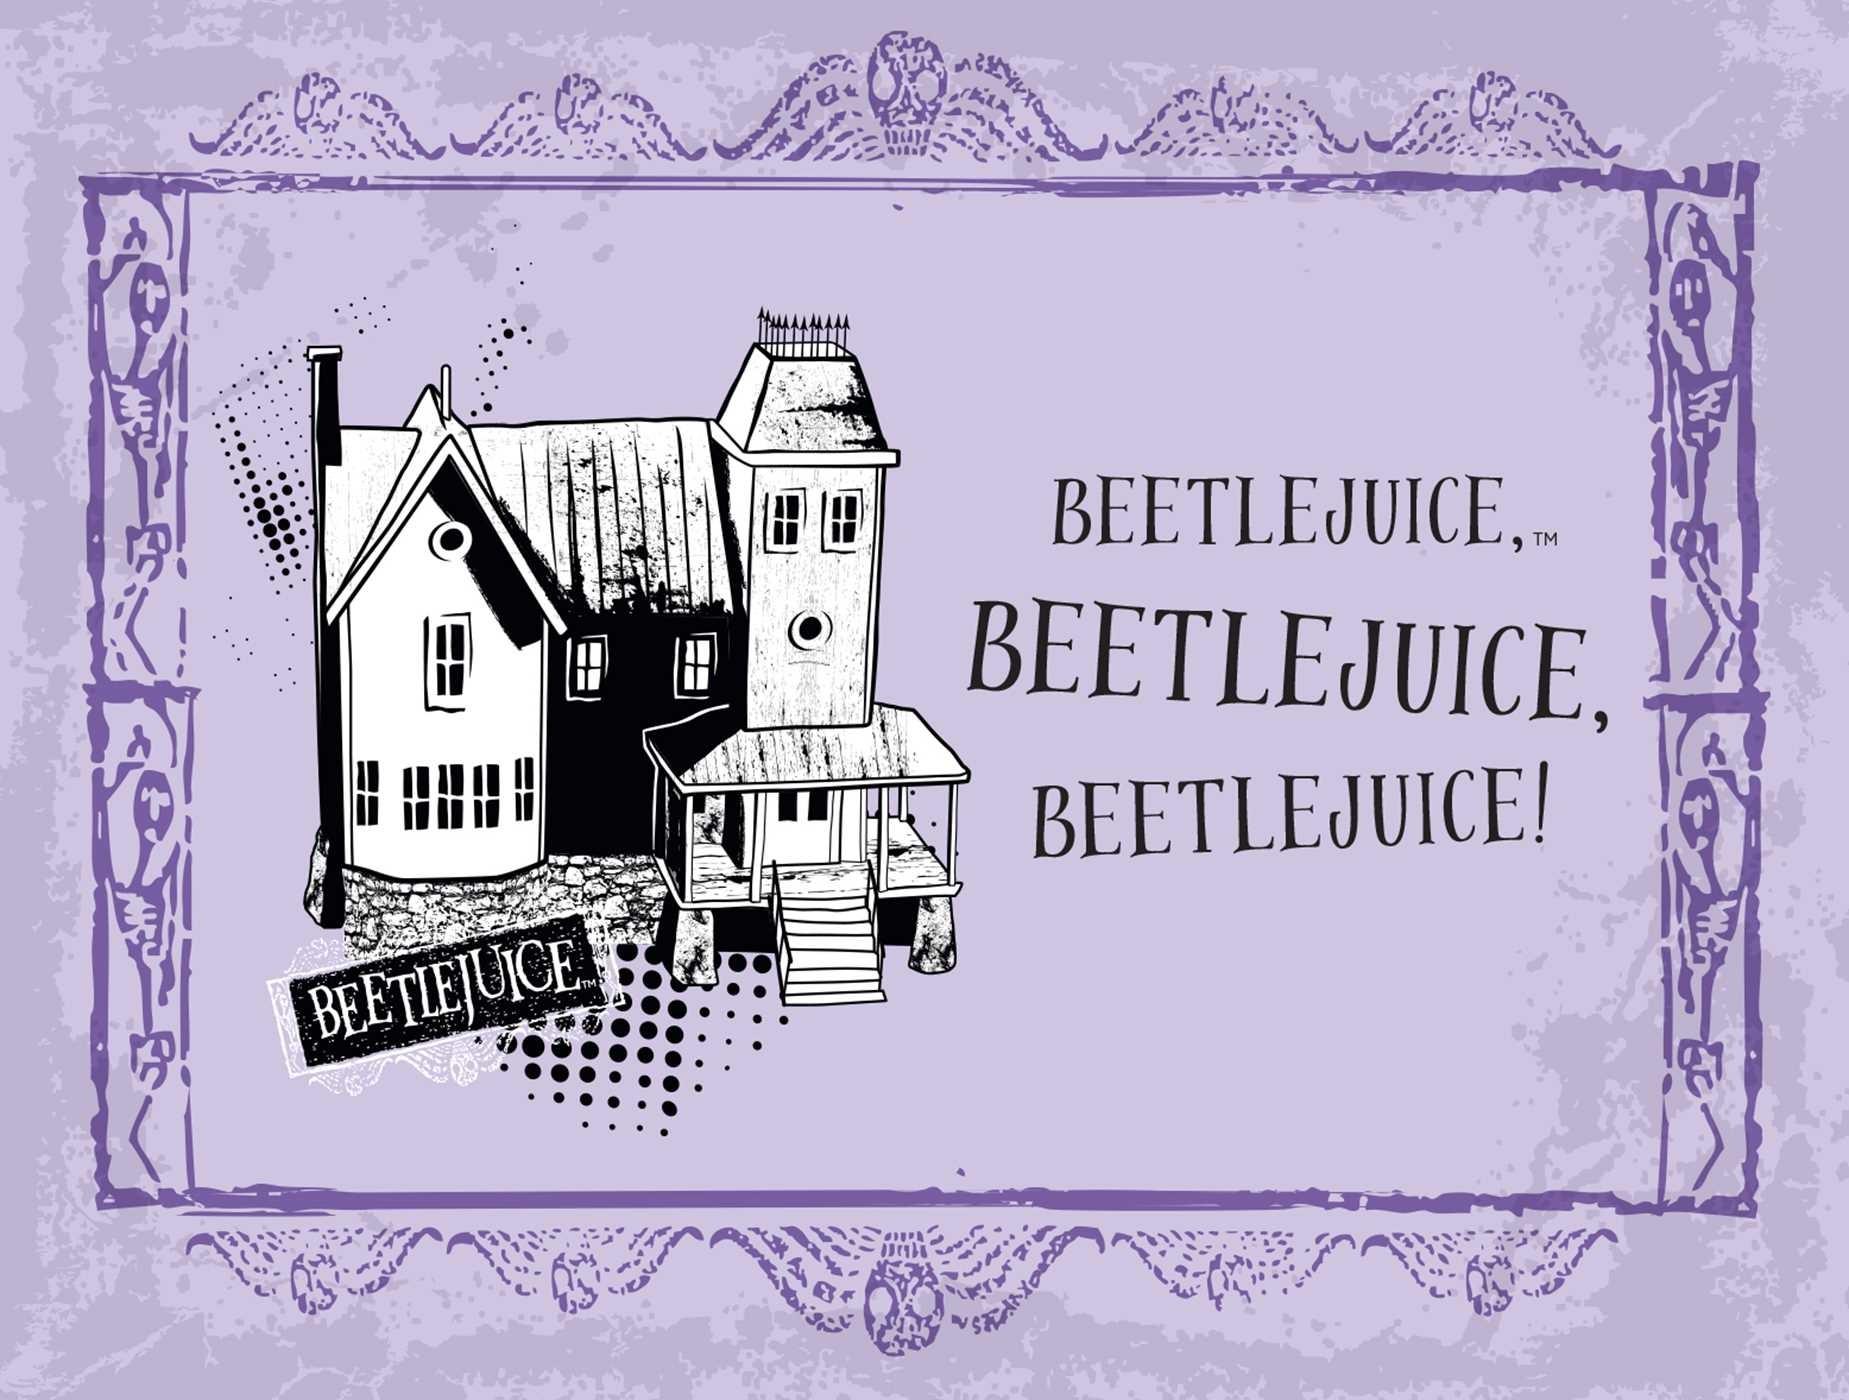 Beetlejuice handbook for the recently deceased deluxe note card set with keepsake book box 9781683833406.in07